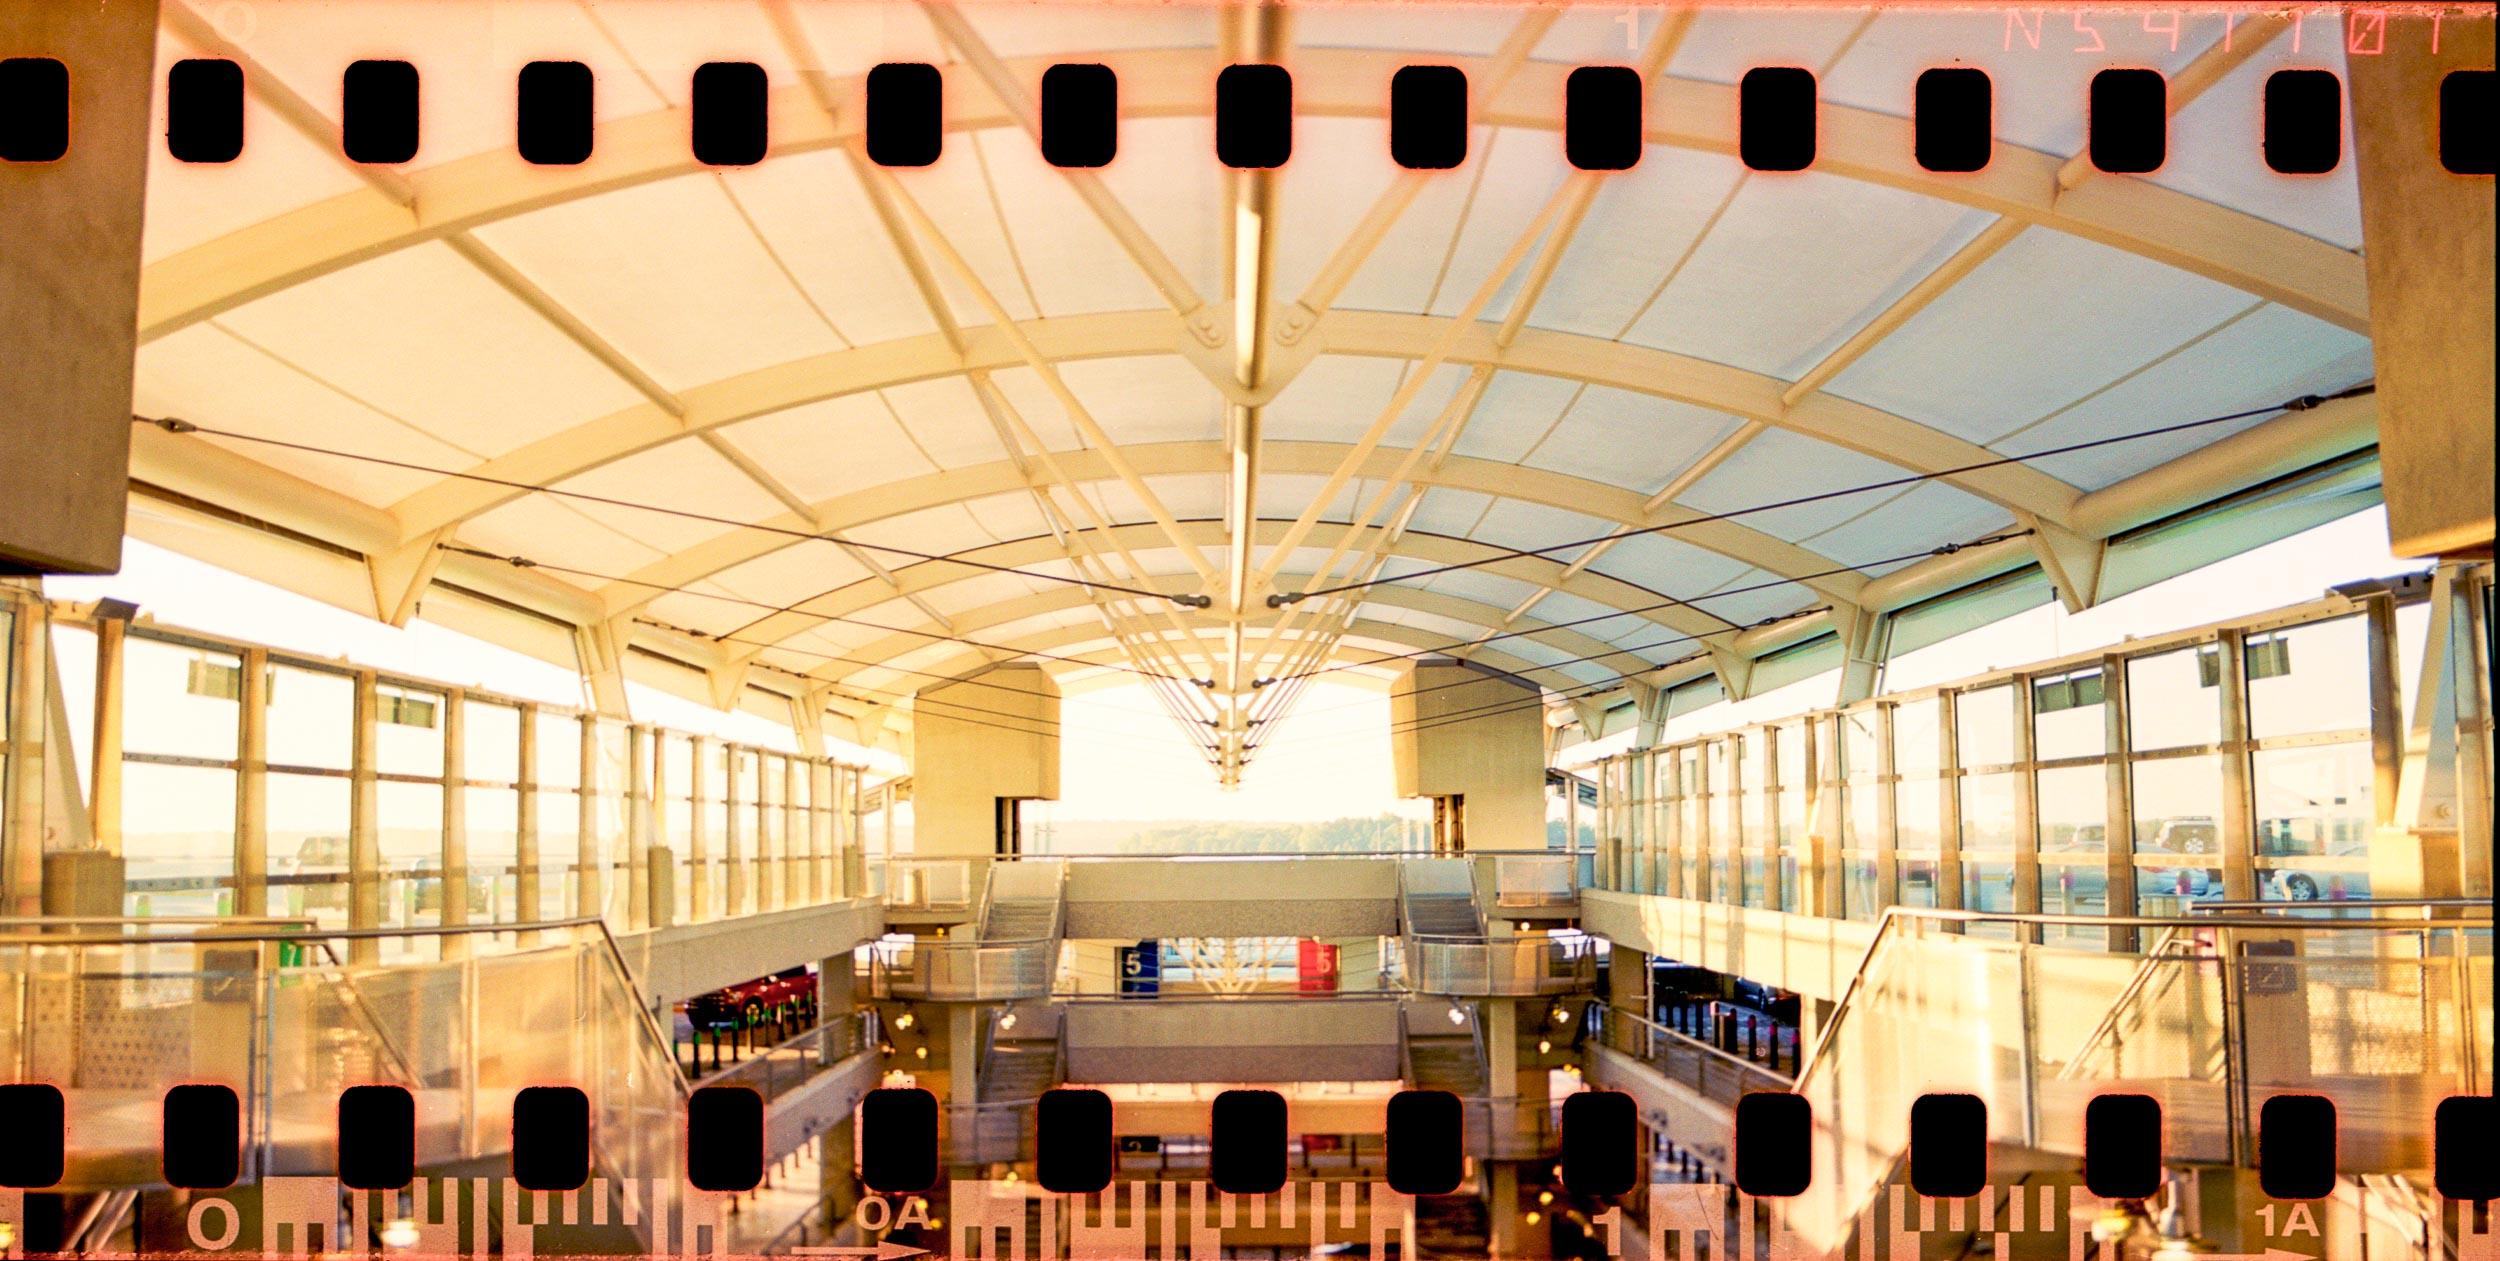 Sunrise at Raleigh-Durham International ■ Pentax 6x7 ■ Kodak Ektar 100 (35mm)